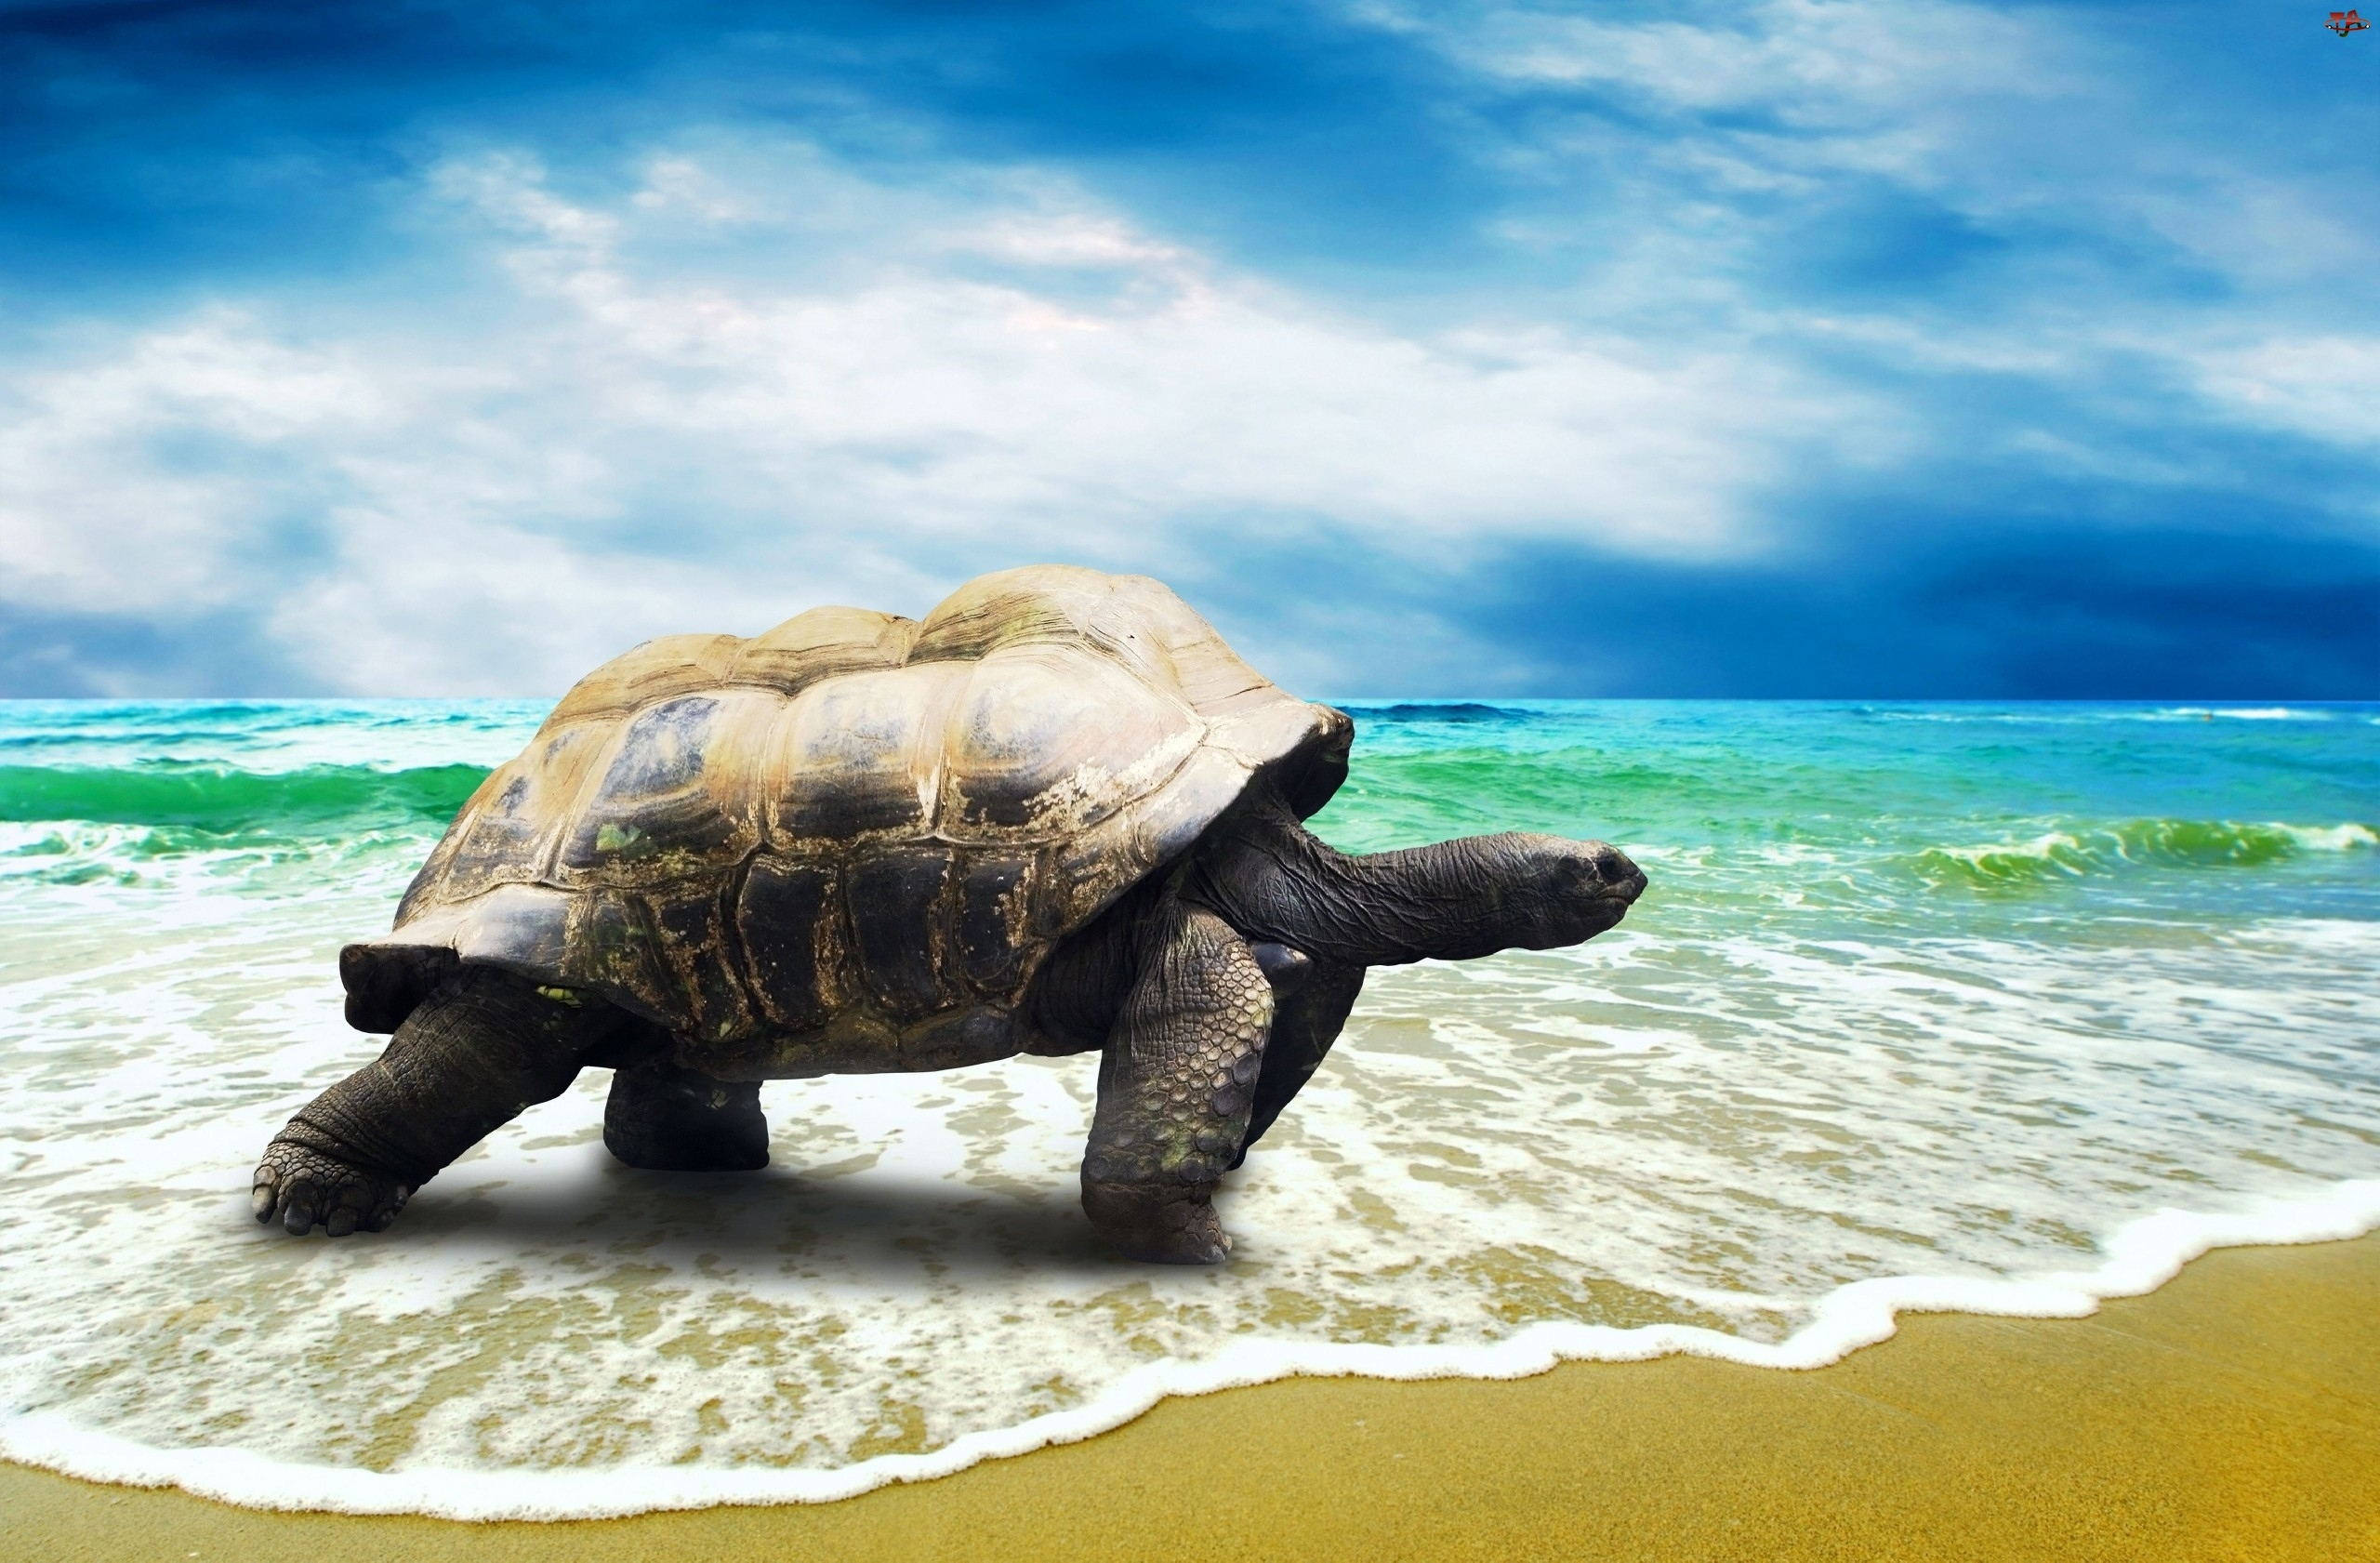 Żółw, Niebo, Morze, Fale